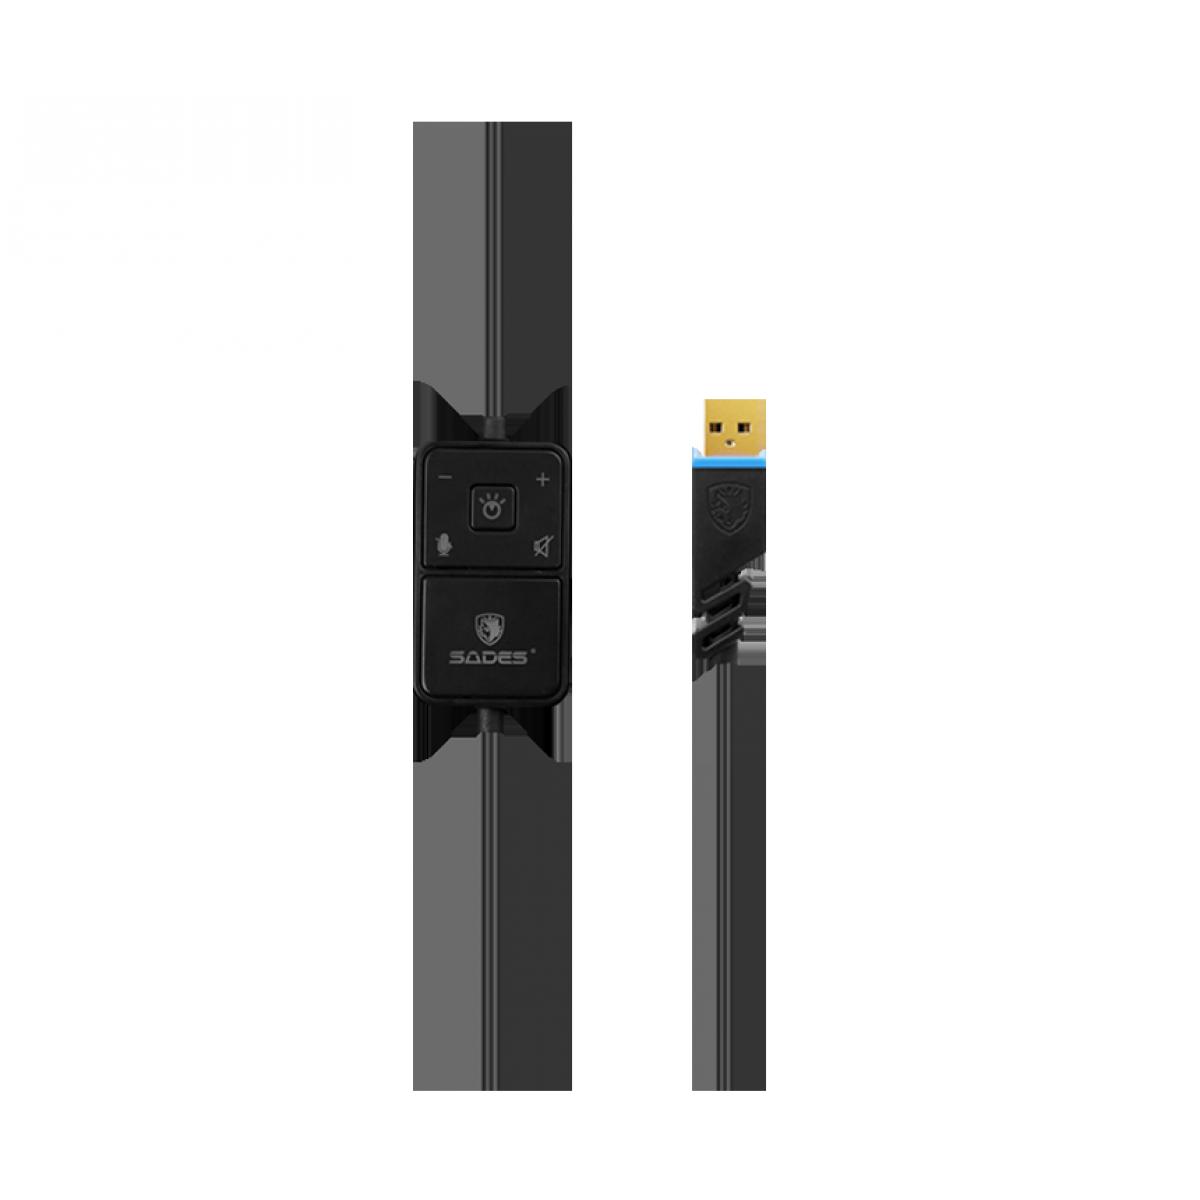 Headset Gamer Sades Sa-968 Luna, 7.1 Surround, Black/Blue, SA-968